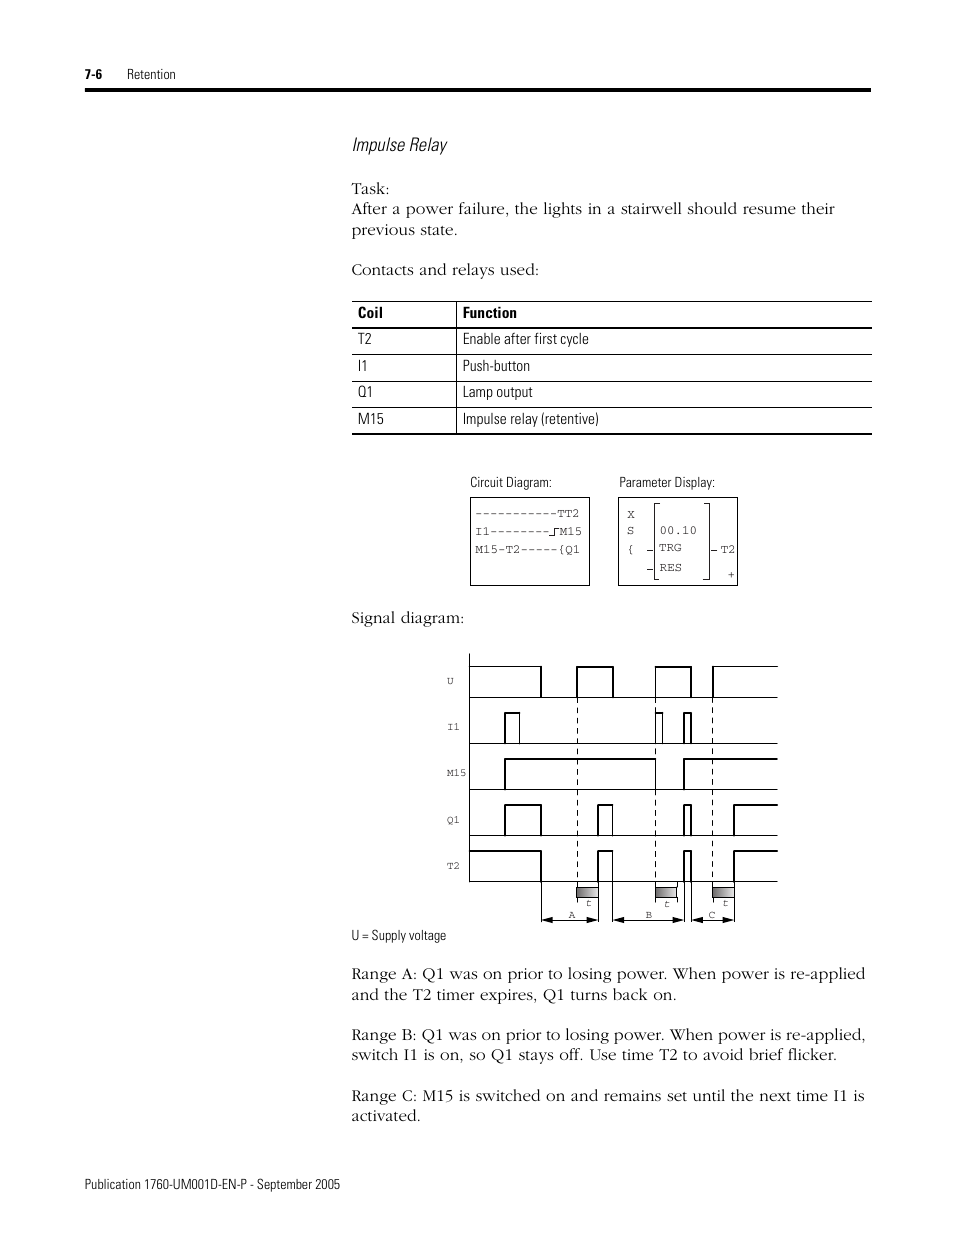 Amazing pico wiring diagram images best image